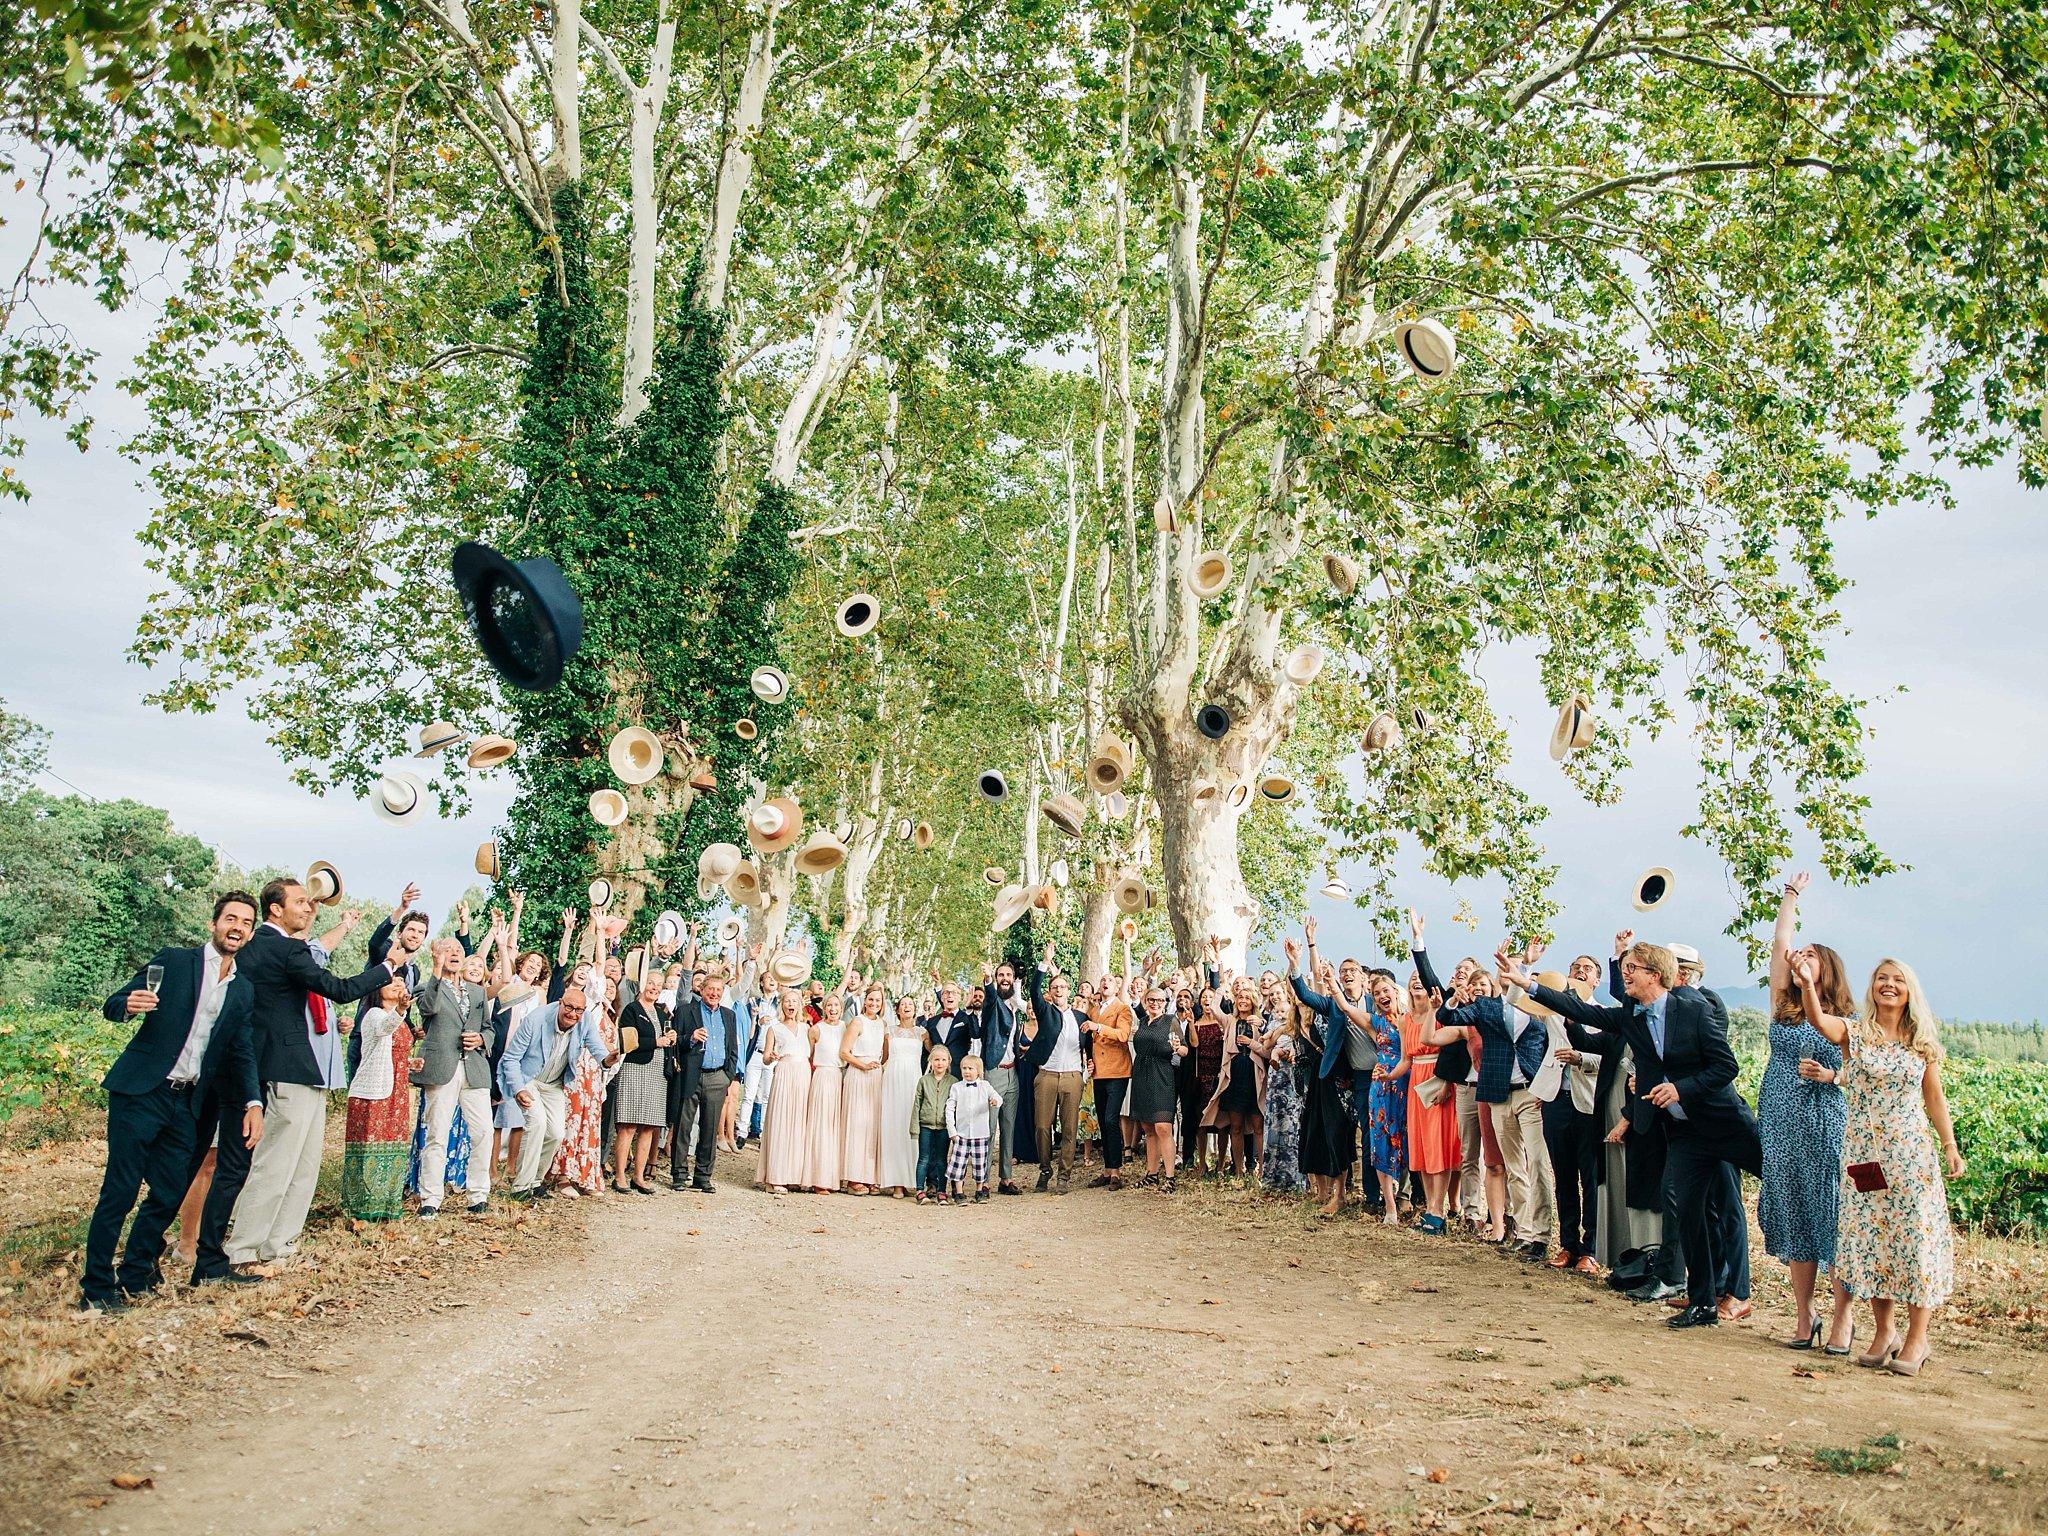 Wedding Photographer Perpignan - Château Las Collas Wedding - Hugo Hennequin080.jpg